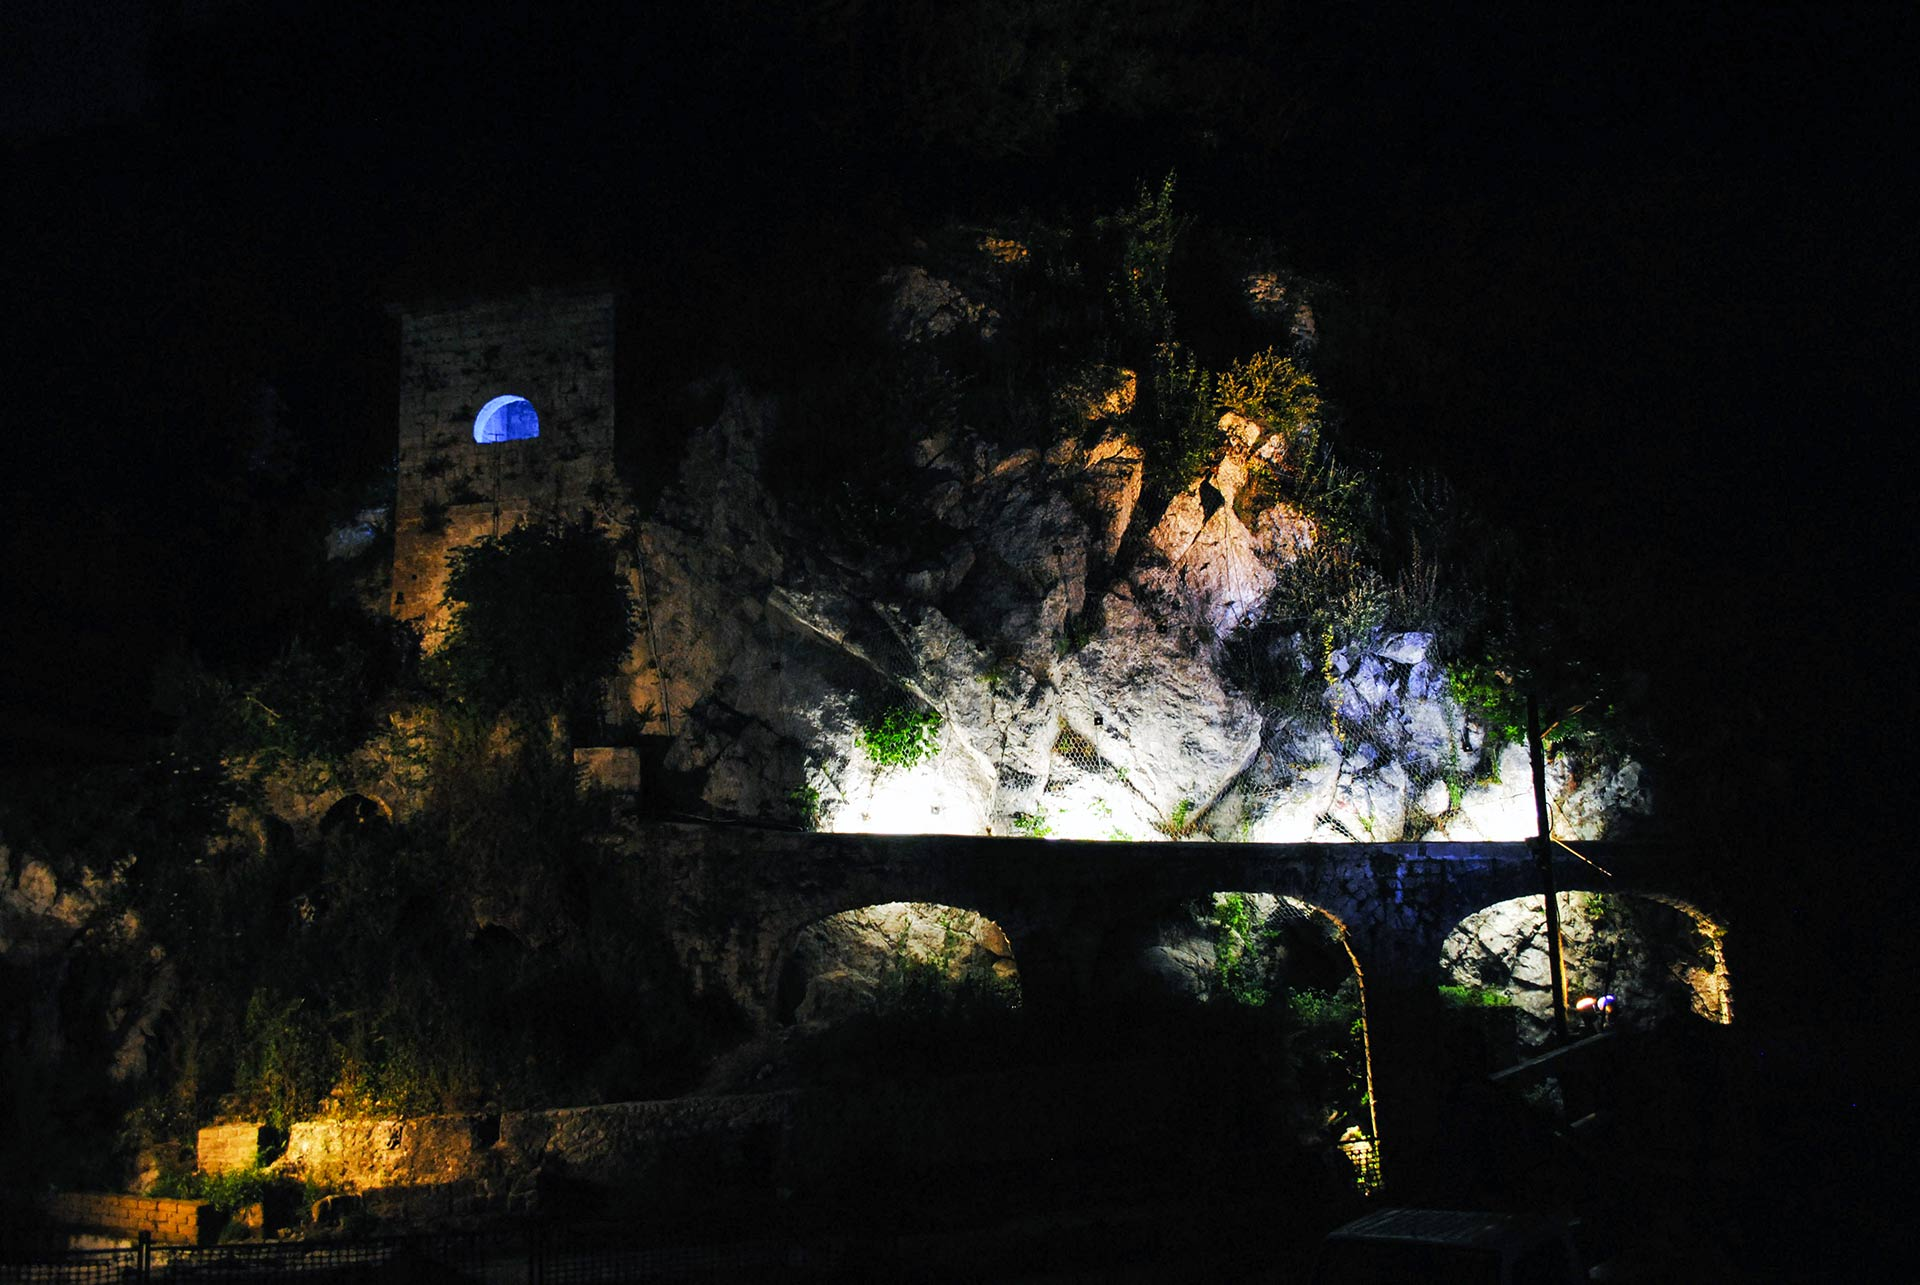 fontana sant'agata dei goti